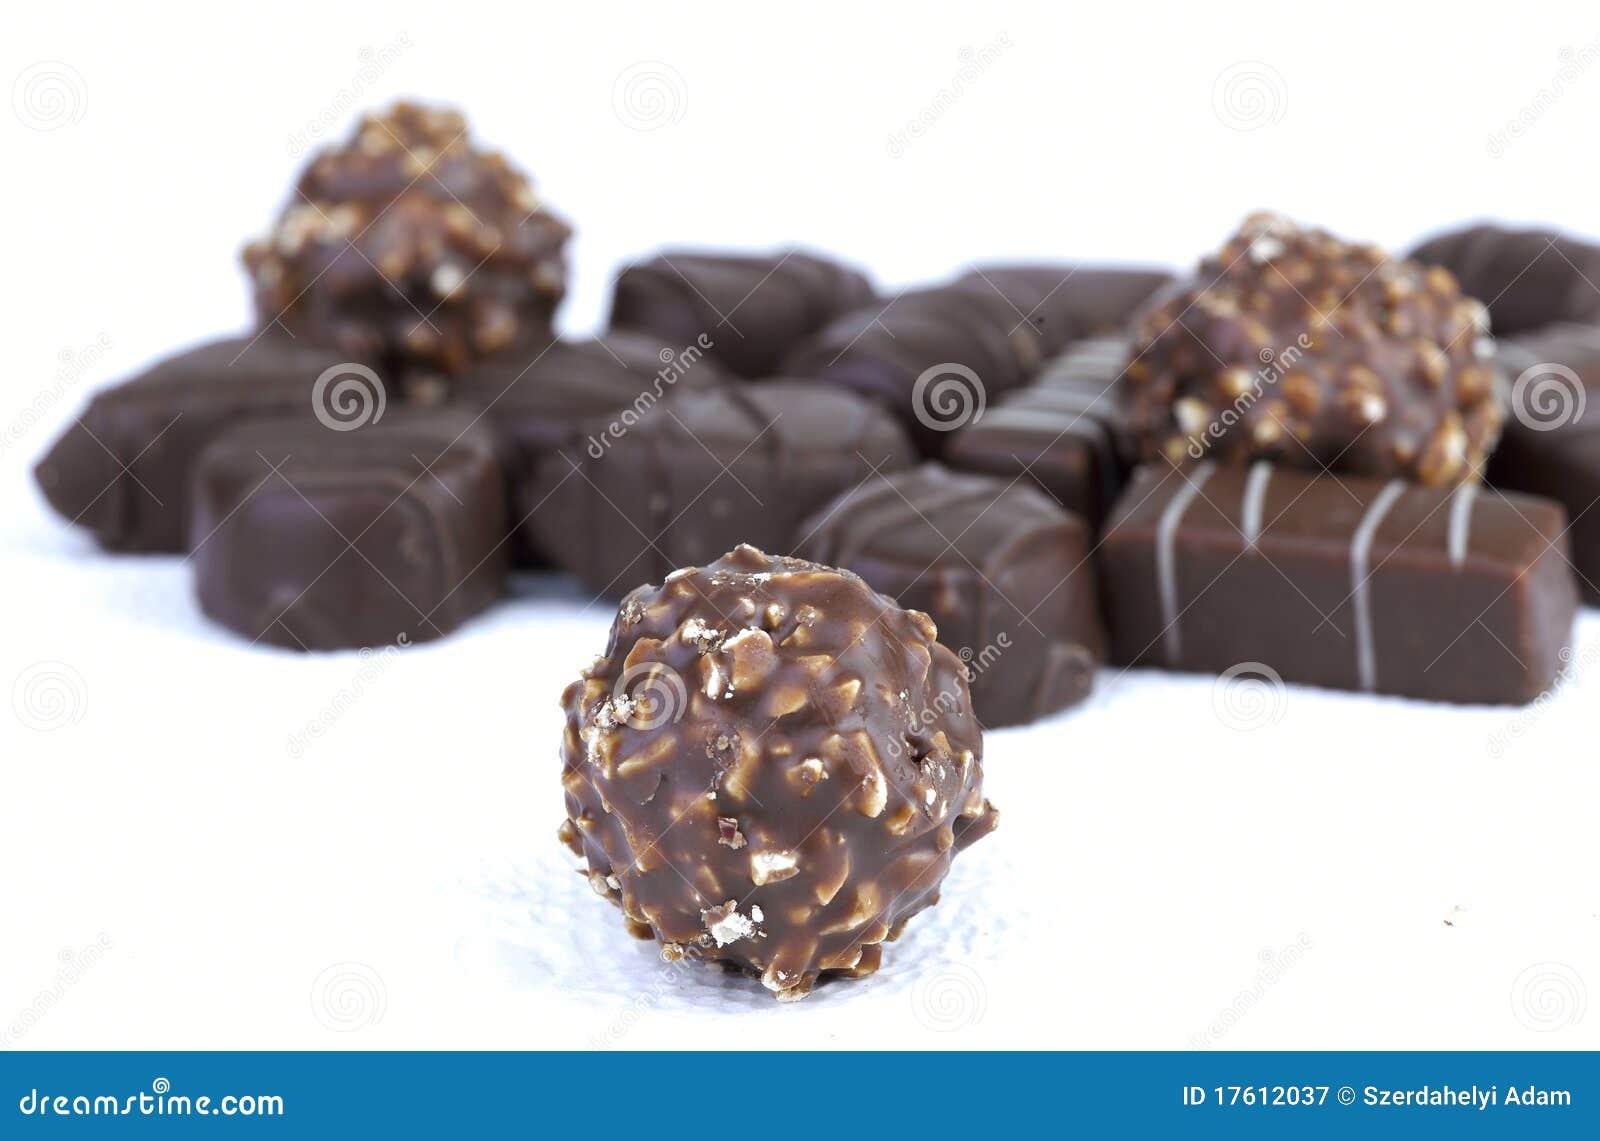 шоколад вкусный